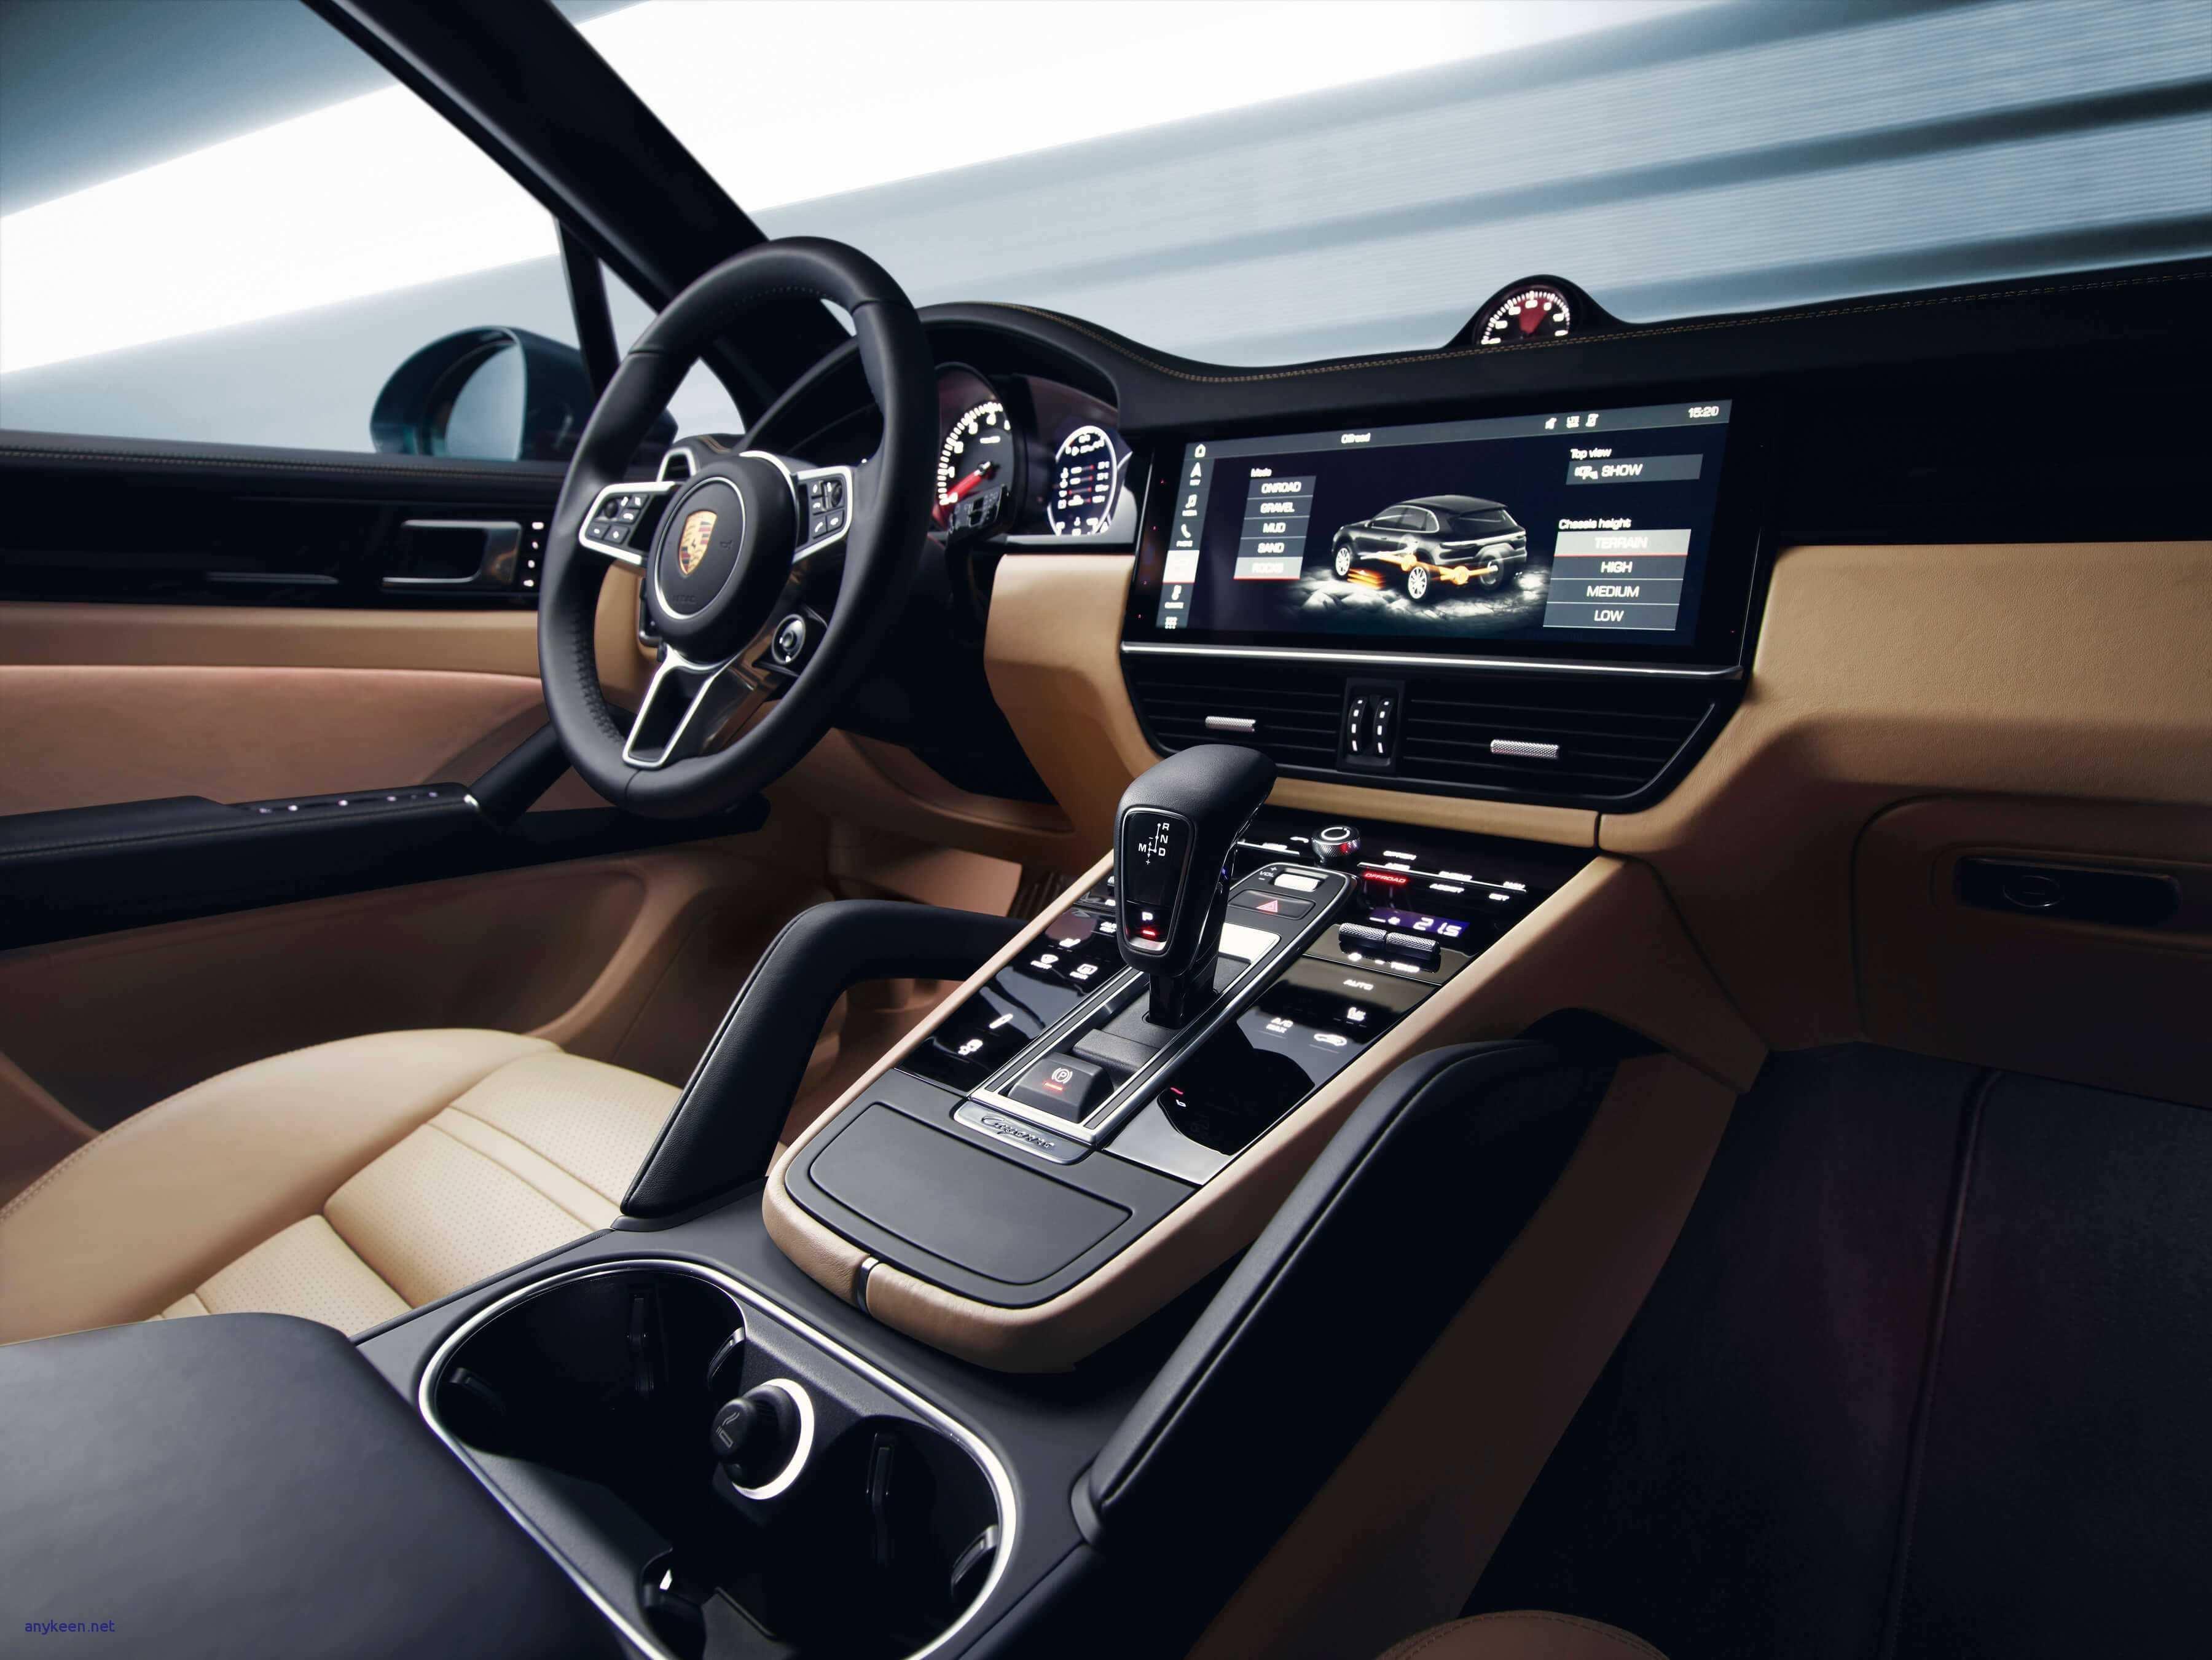 92 Concept of 2020 Porsche Cayenne Turbo S Performance and New Engine for 2020 Porsche Cayenne Turbo S